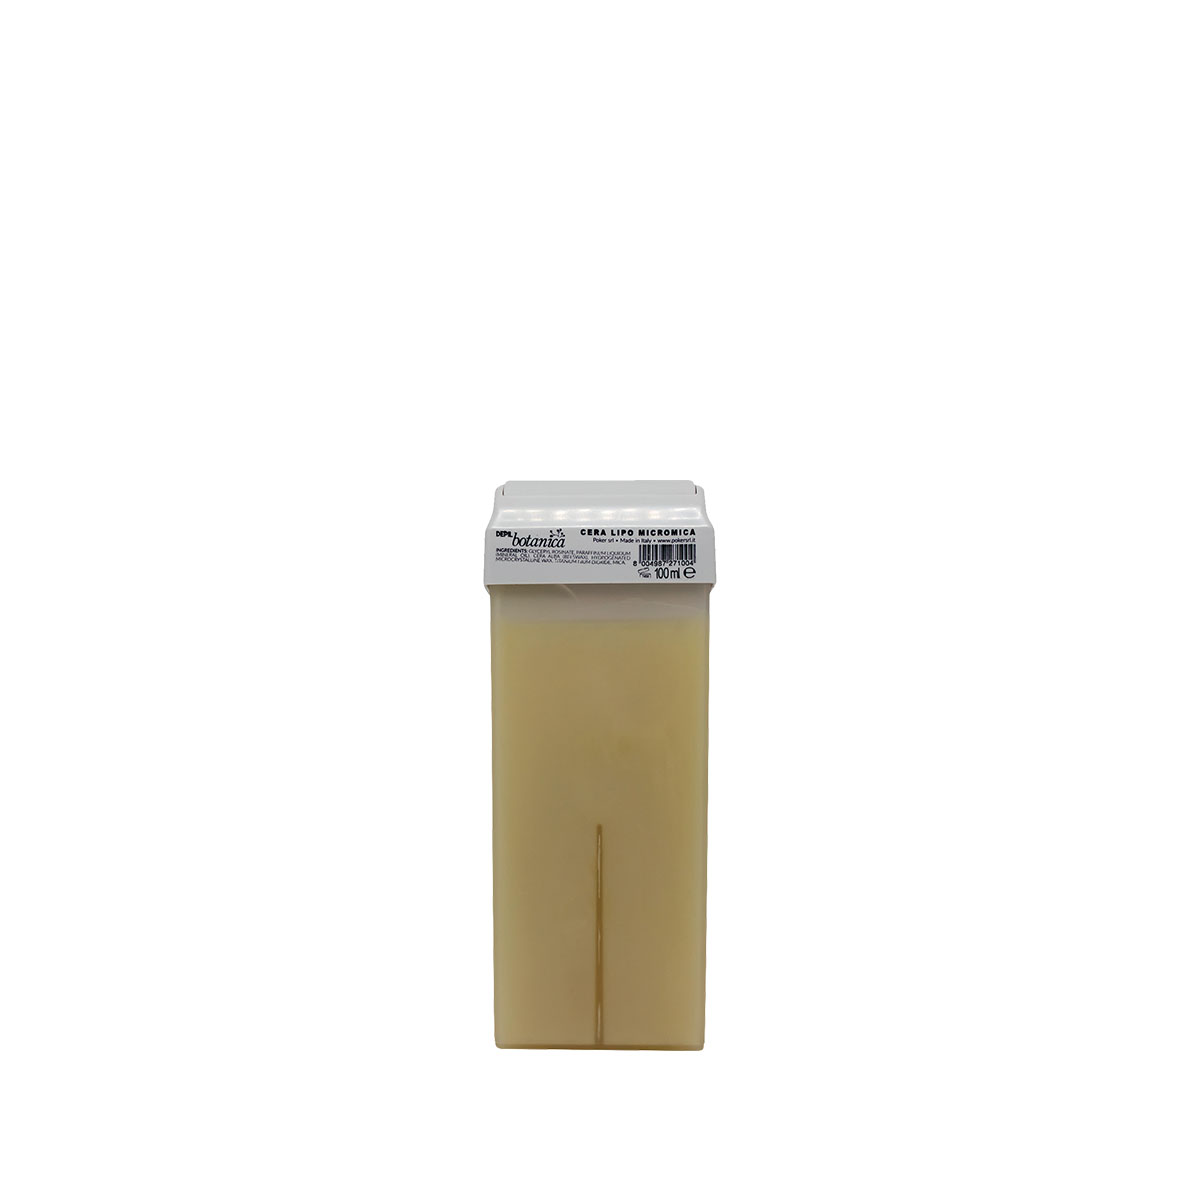 Cere Depil-botanica 100ml Micromica